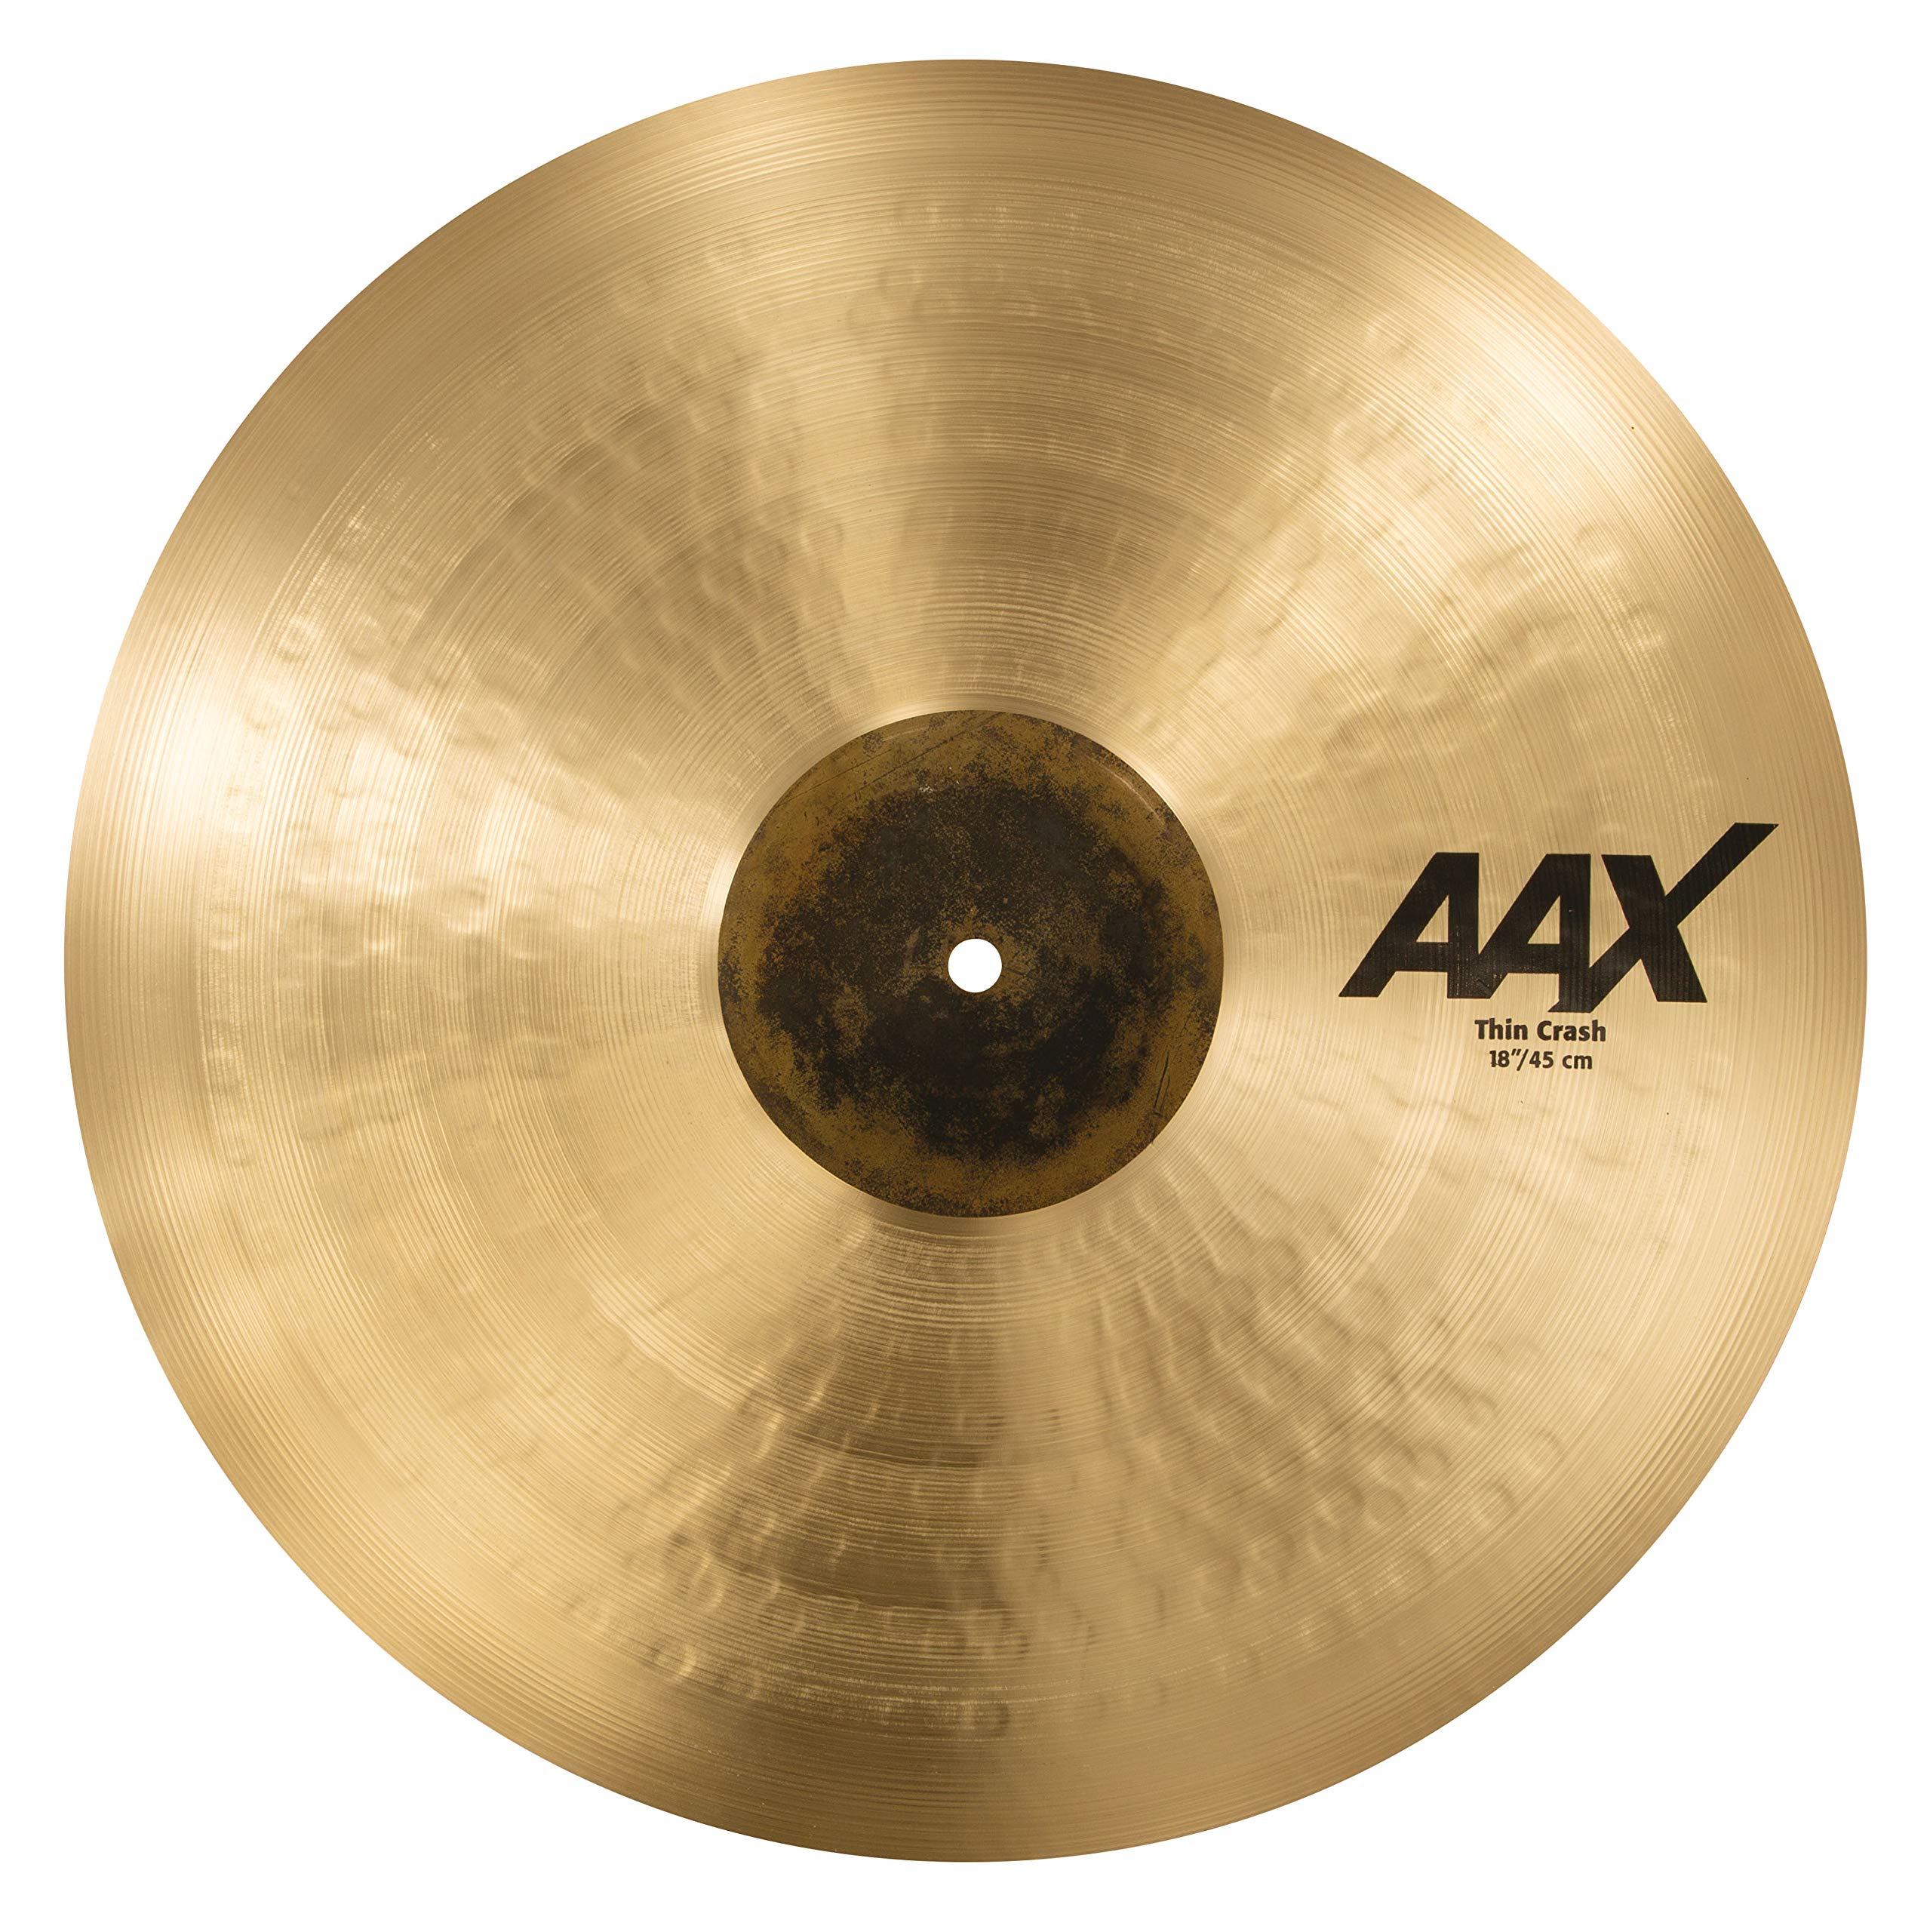 Sabian Crash Cymbal AAX Thin Natural Finish 18'' 21806XC